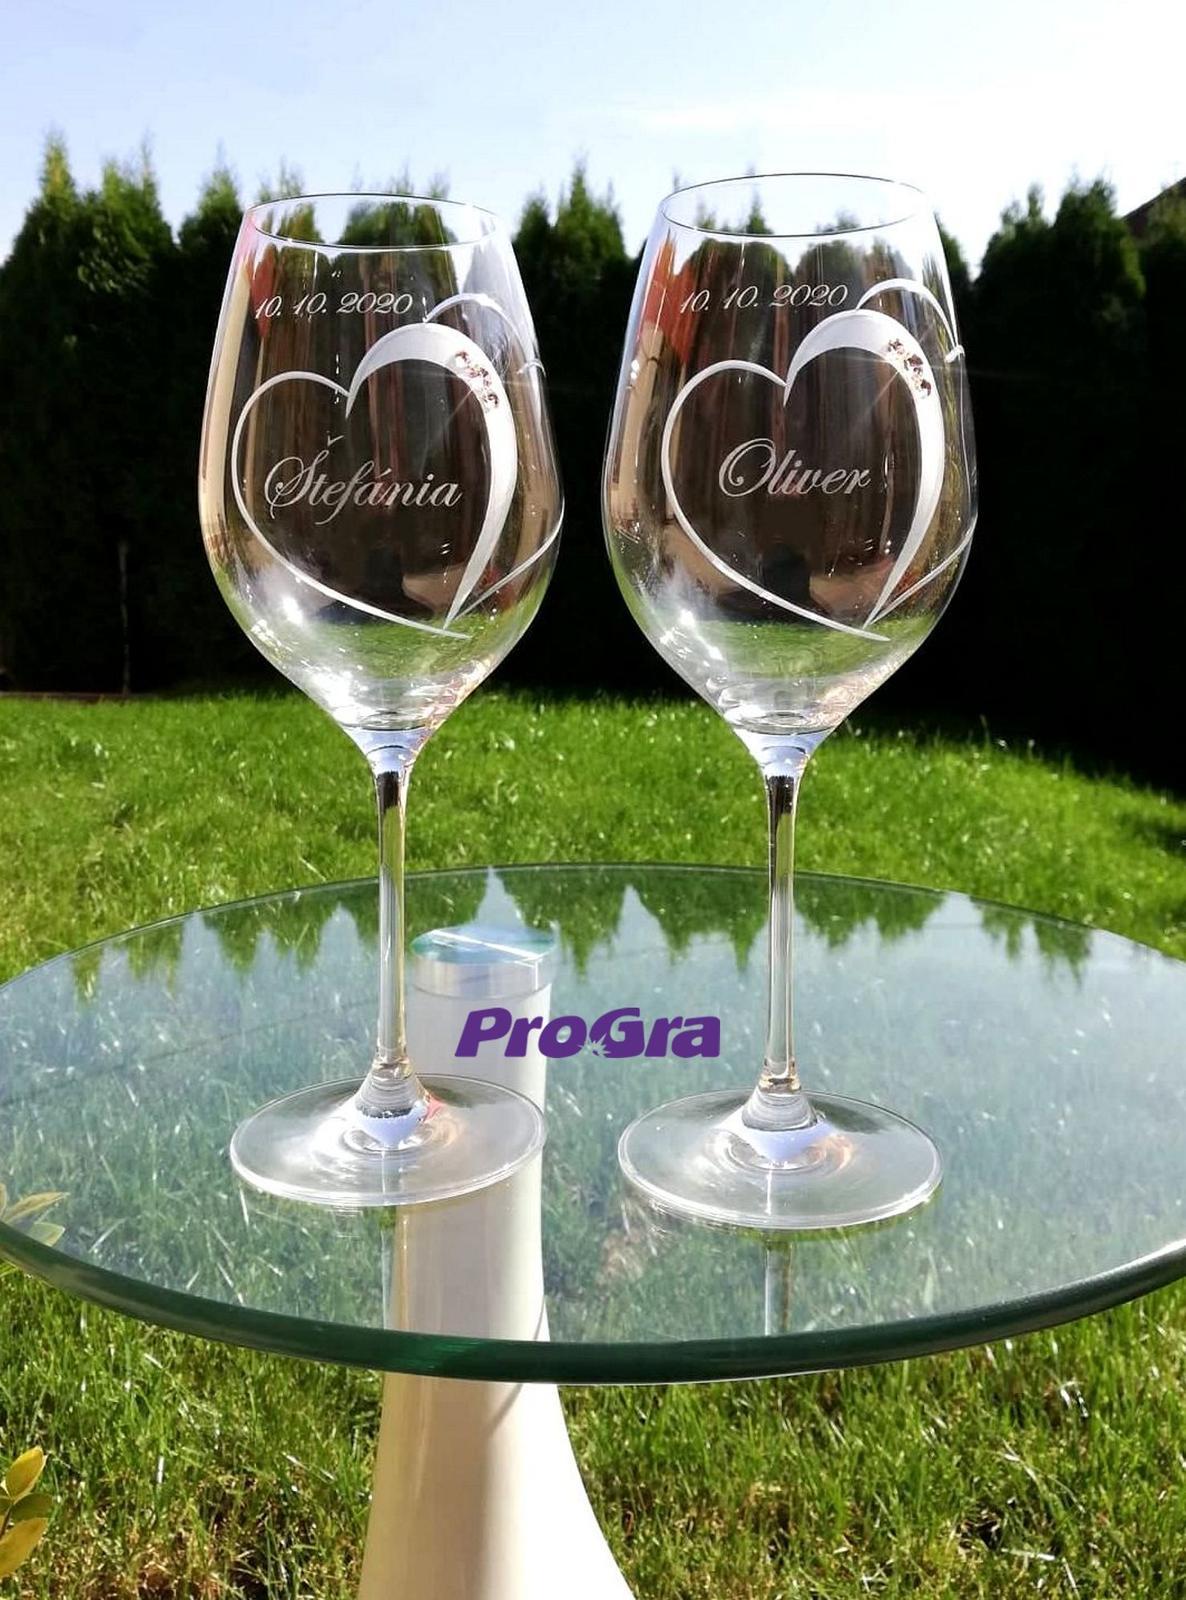 Violet - svadobné poháre - 2ks - Obrázok č. 2